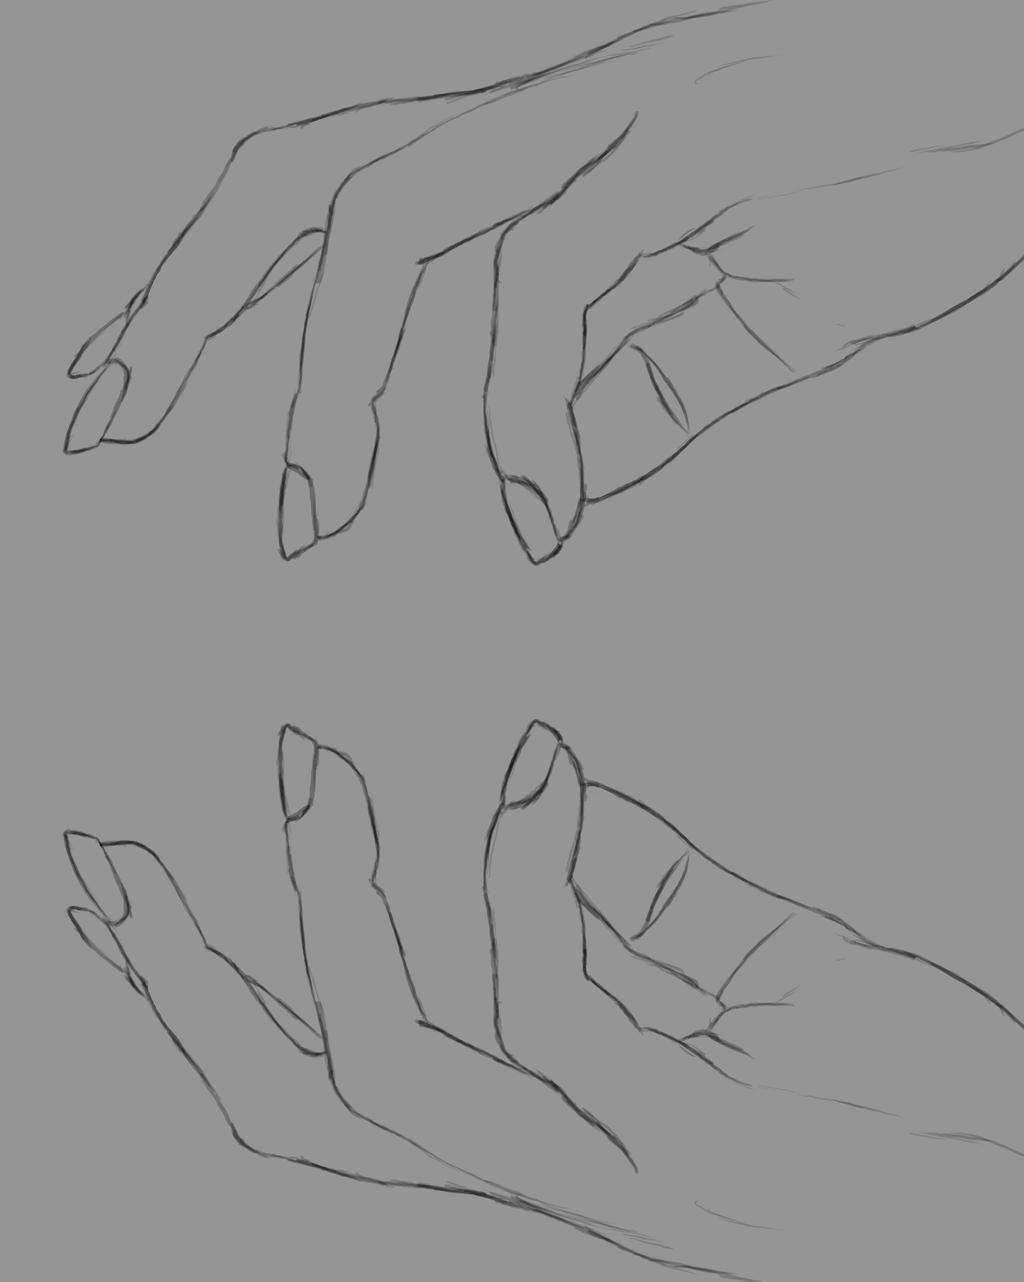 Hands  Daily sketch #554 by GothicVampireFreak